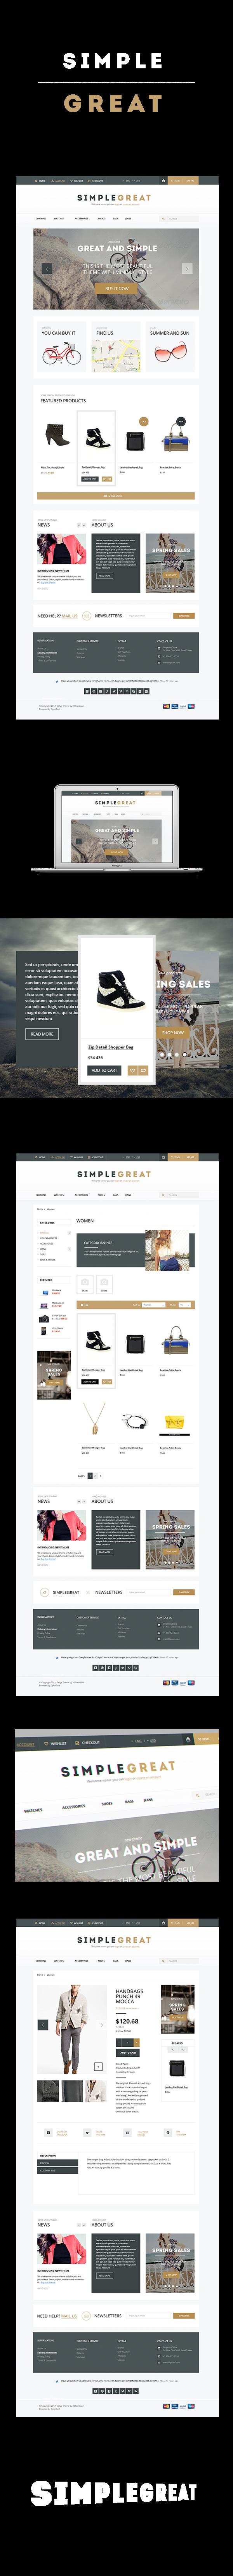 Web,design,shop,opencart,themeforest,Webdesign